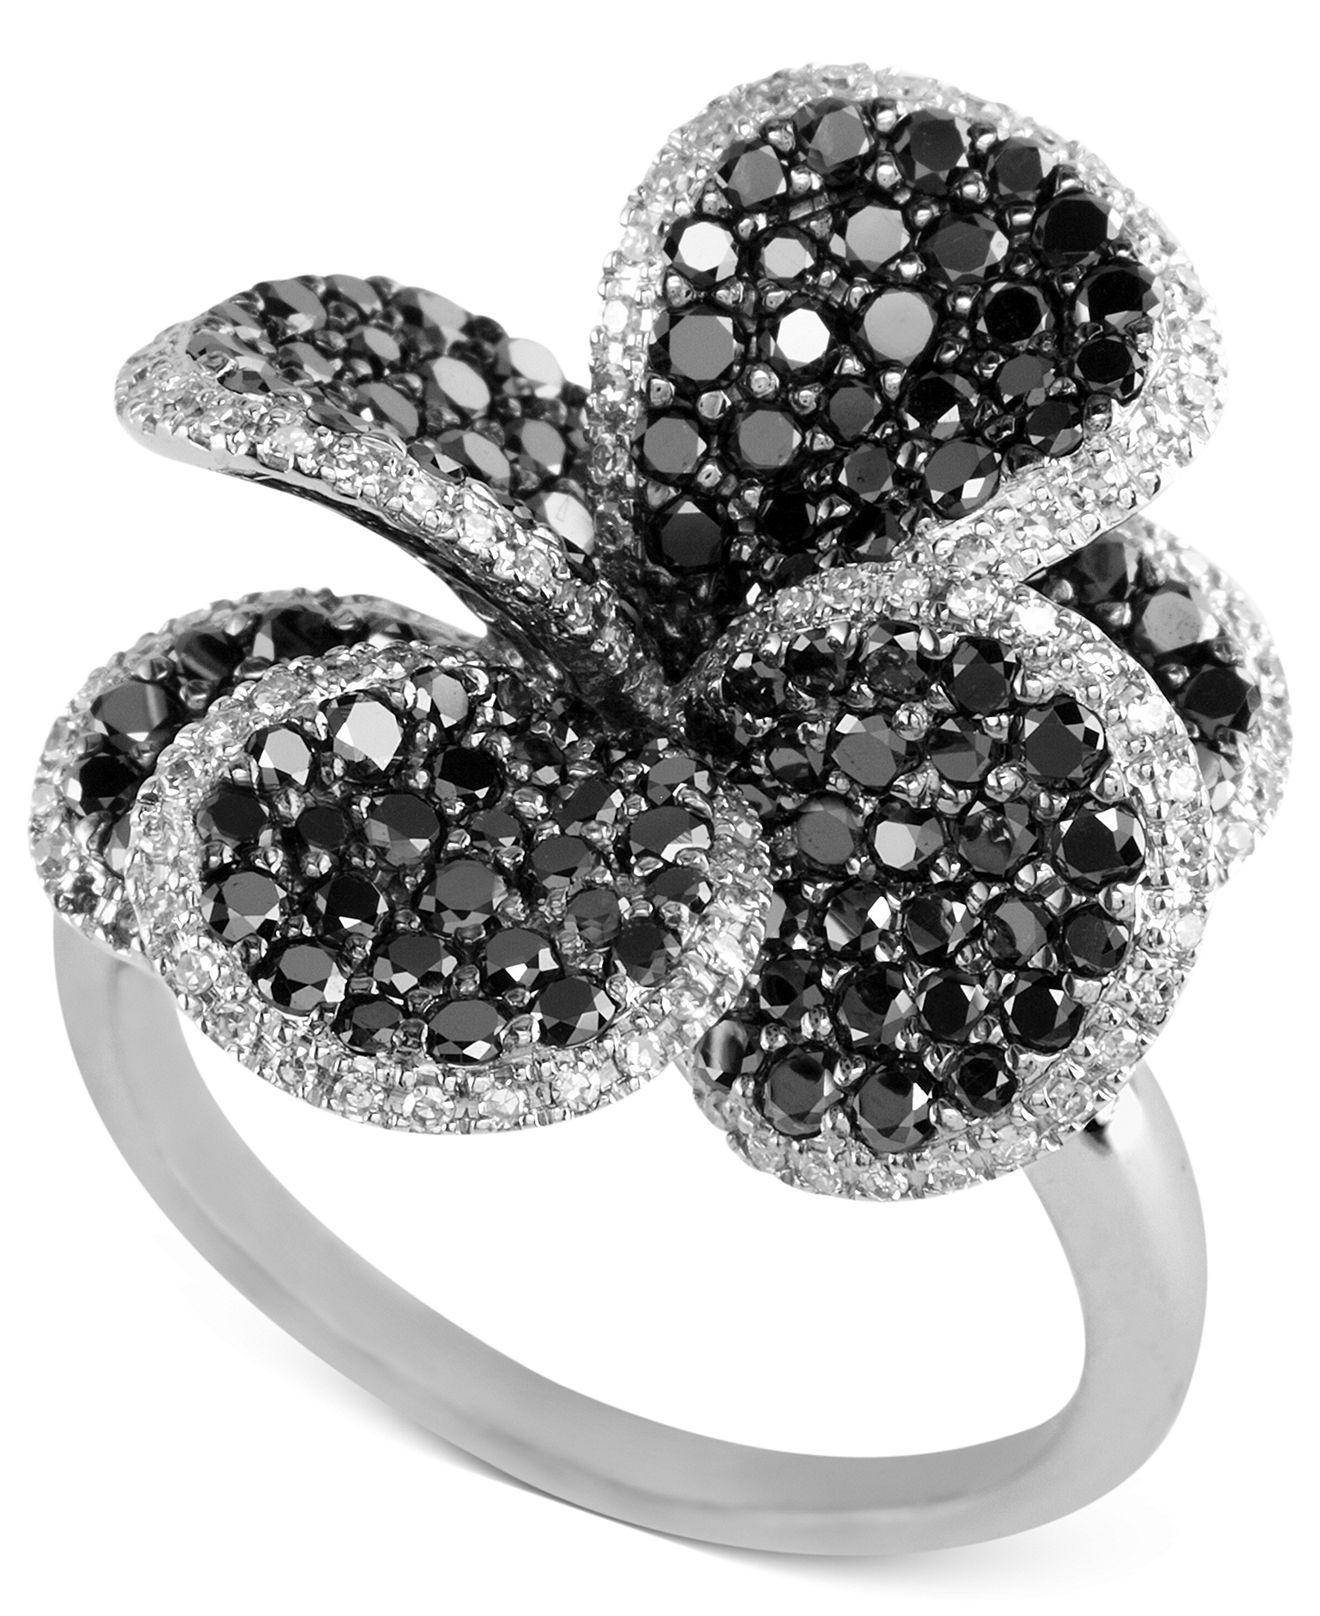 Black Flower Bow With Diamond: EFFY 14k White Gold Ring, Black And White Diamond Flower